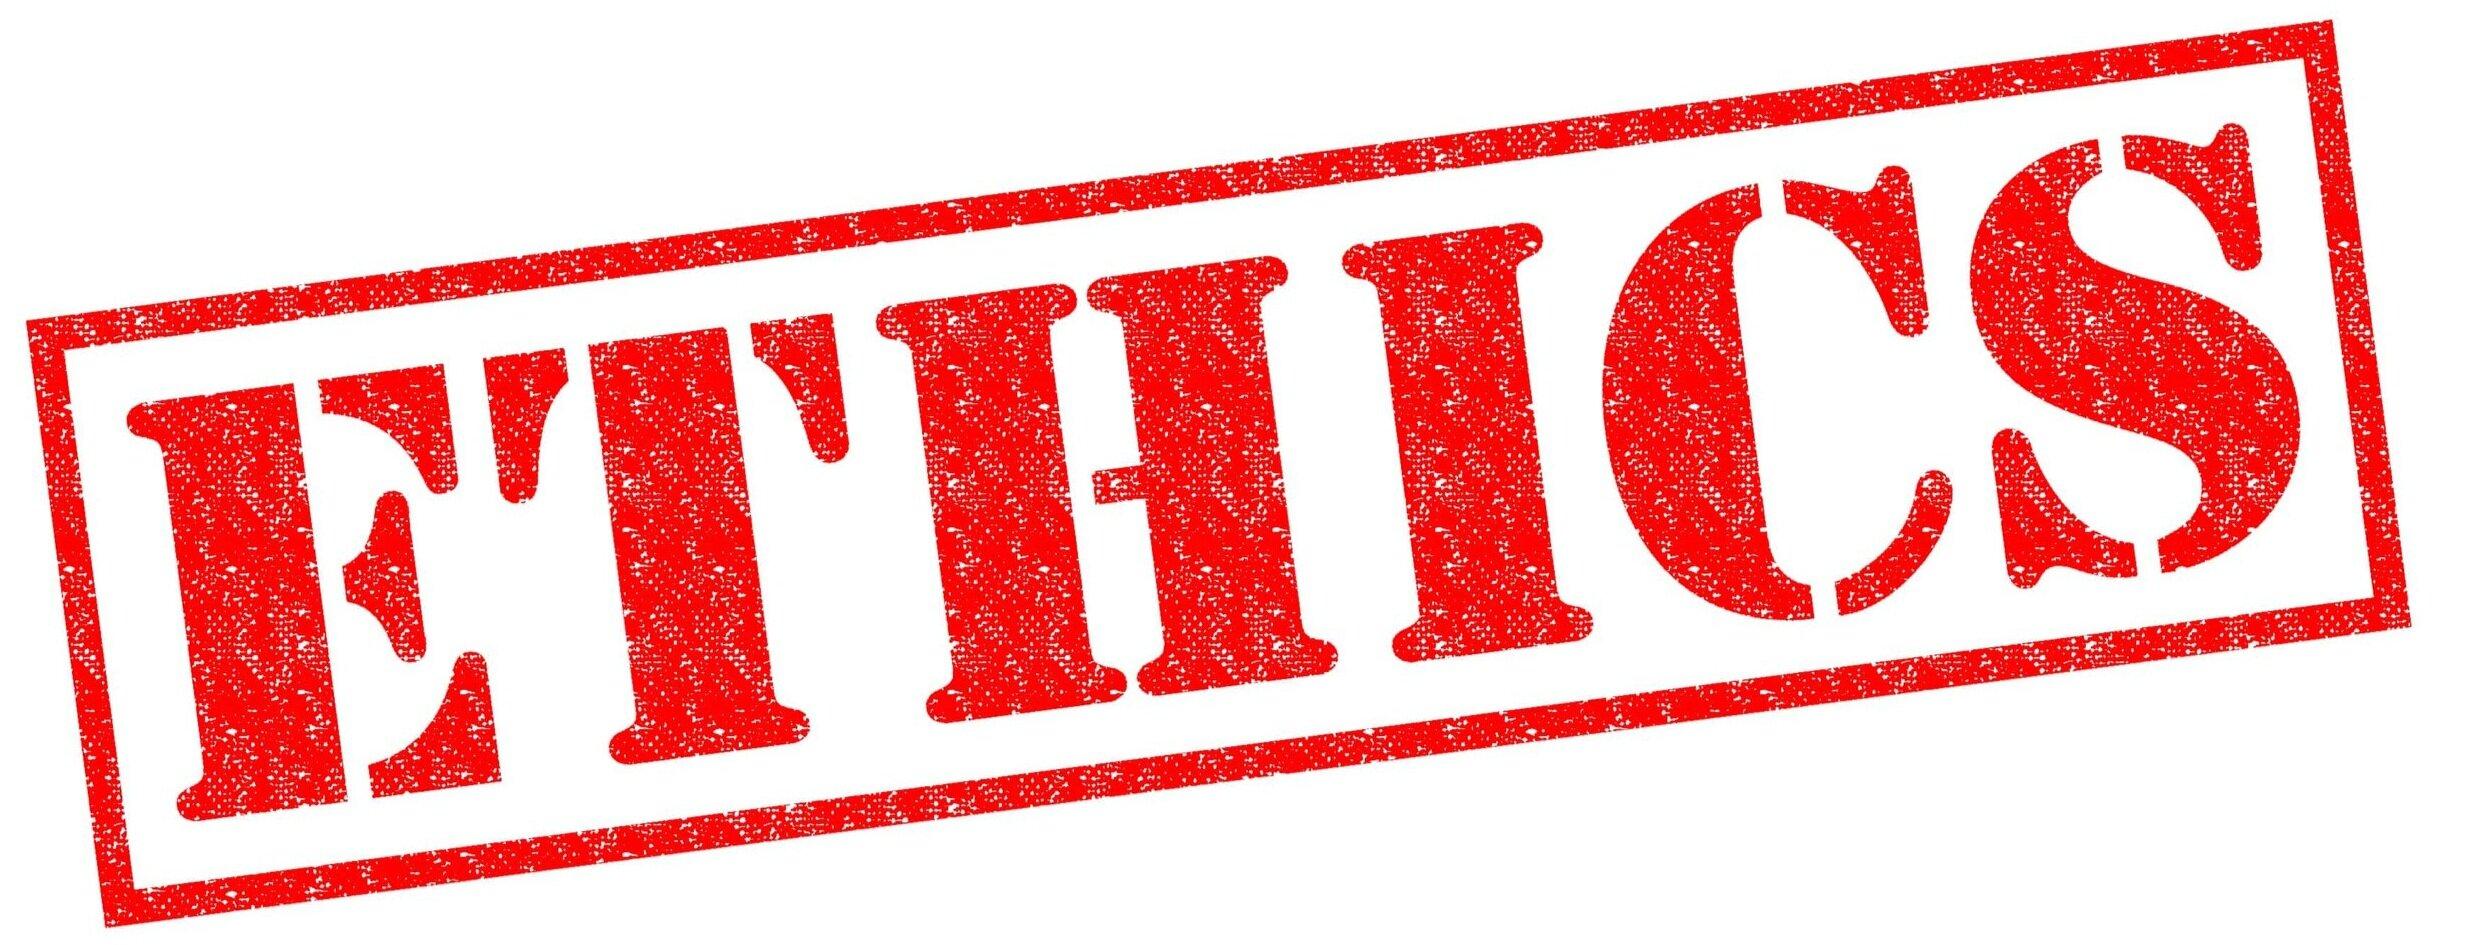 ethics-compress-final.jpg